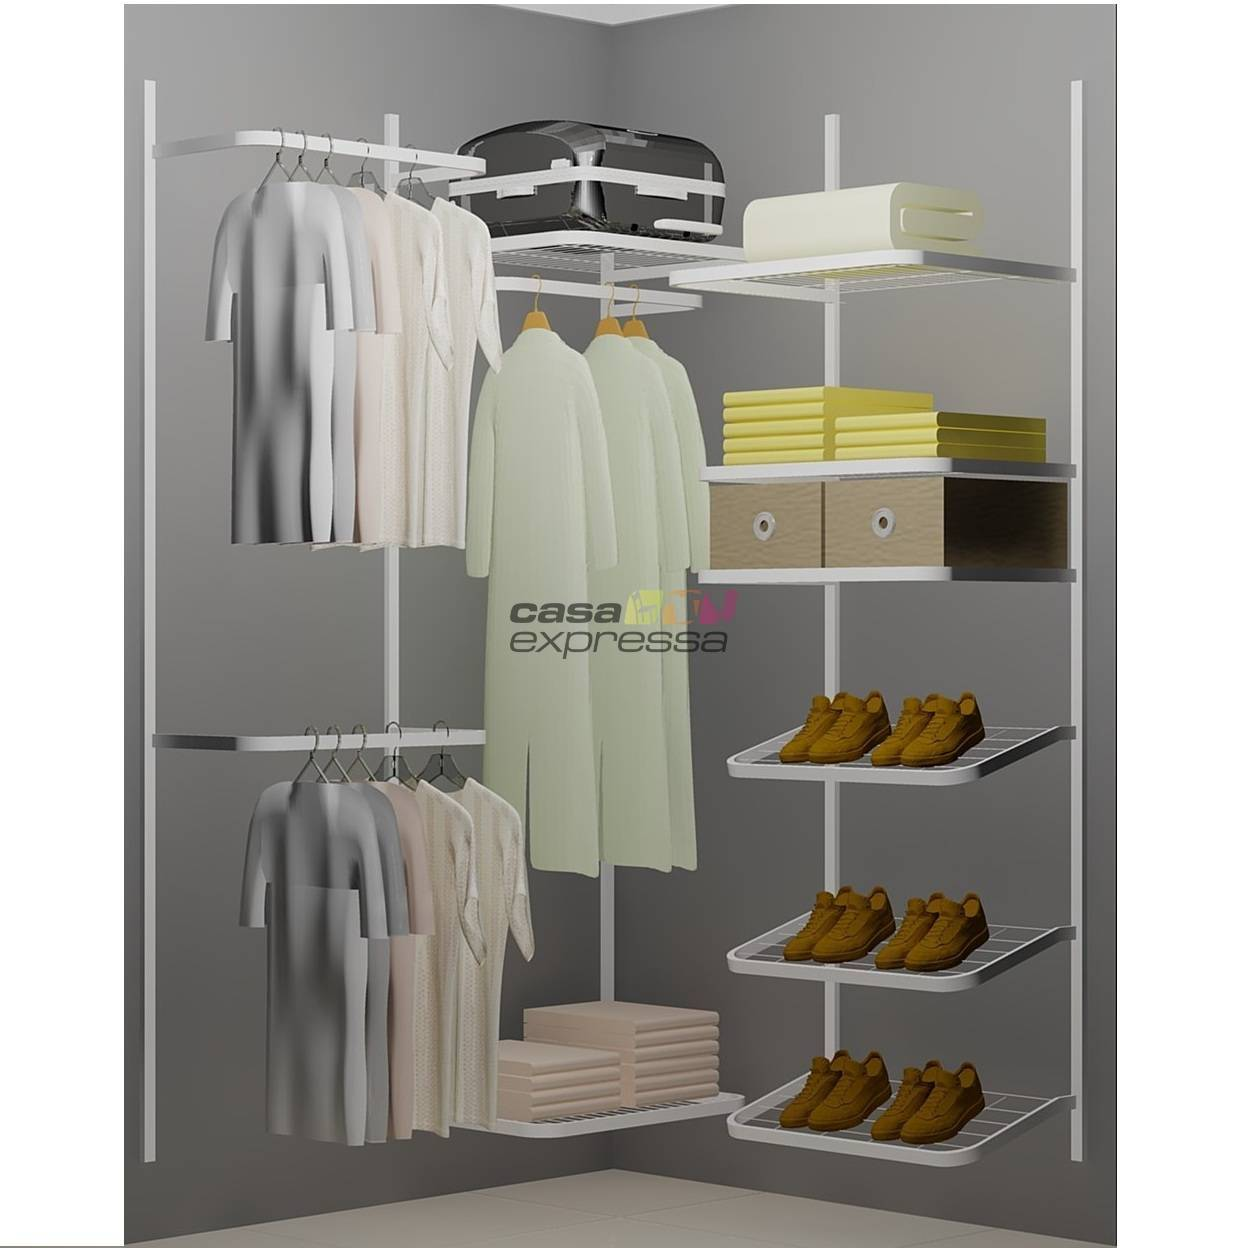 Closet Aramado em L  CLN01 - 1,30 x 1,30m - CASA EXPRESSA